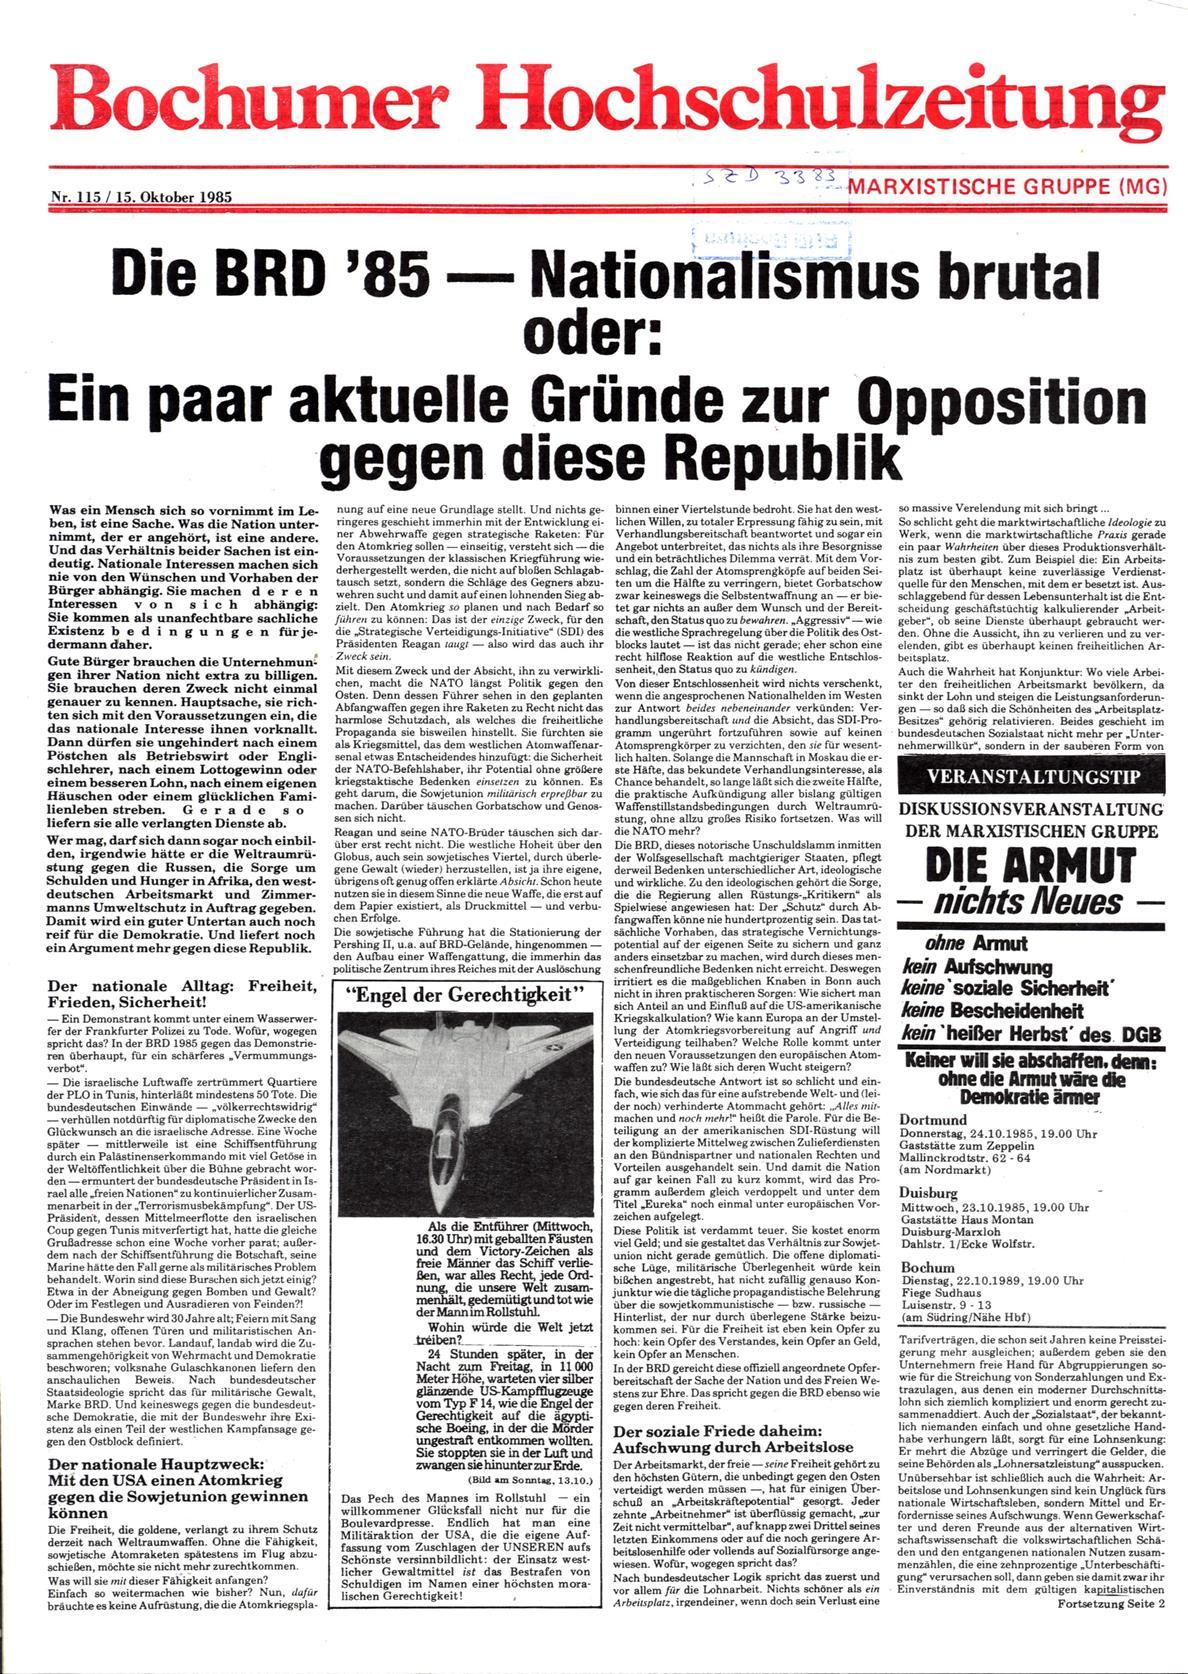 Bochum_BHZ_19851015_115_001